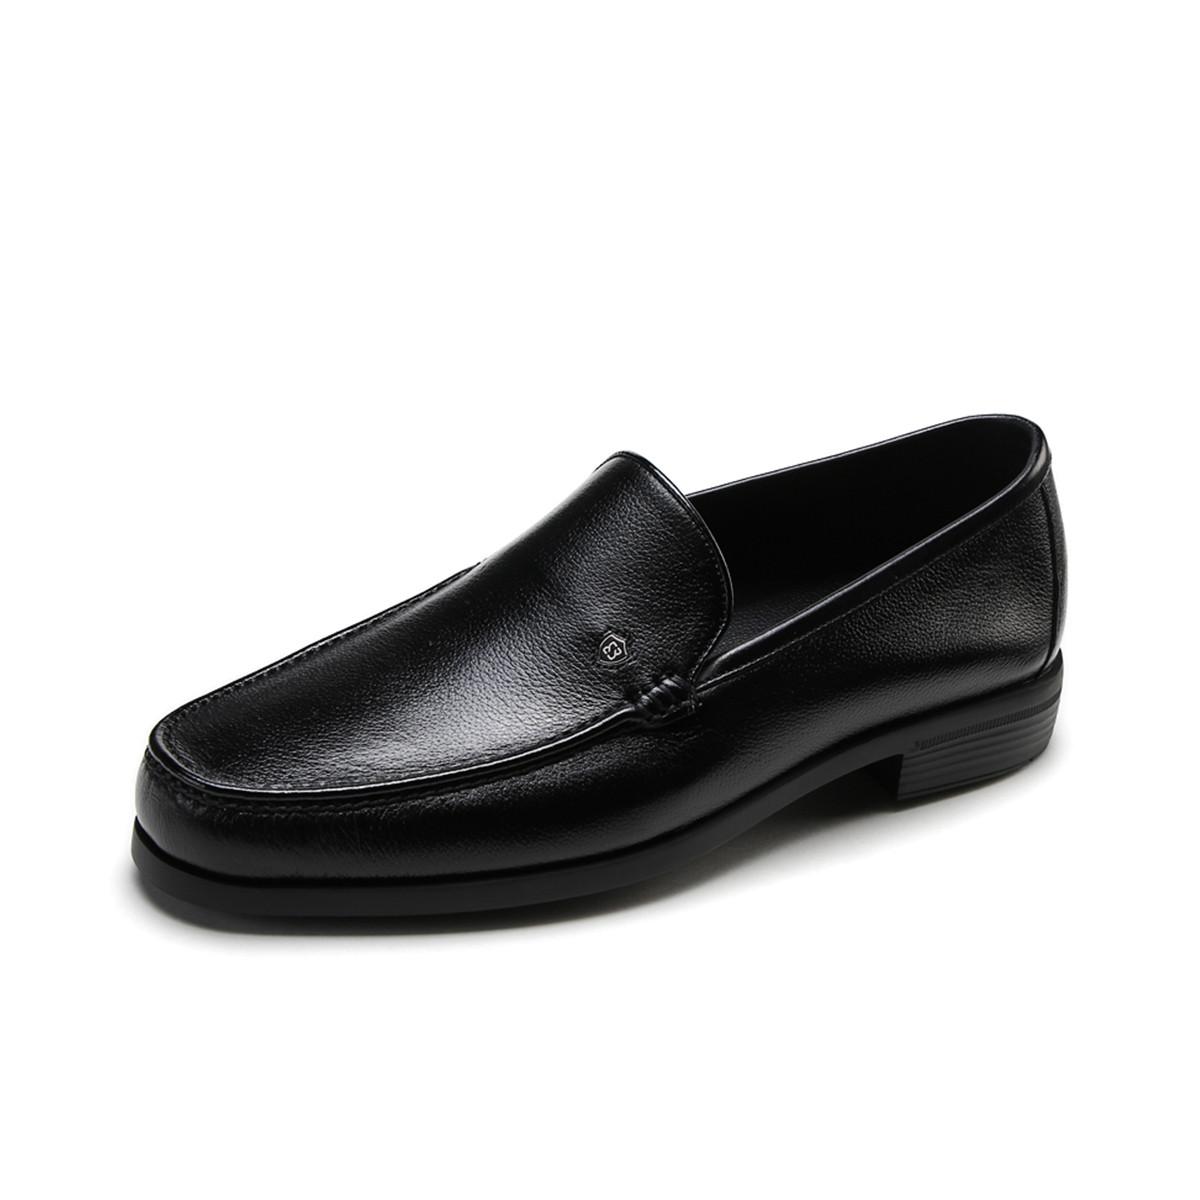 BOSSSUNWEN秋季新品牛皮一脚蹬男款男士商务皮鞋男皮鞋男鞋男士男鞋31811010006691